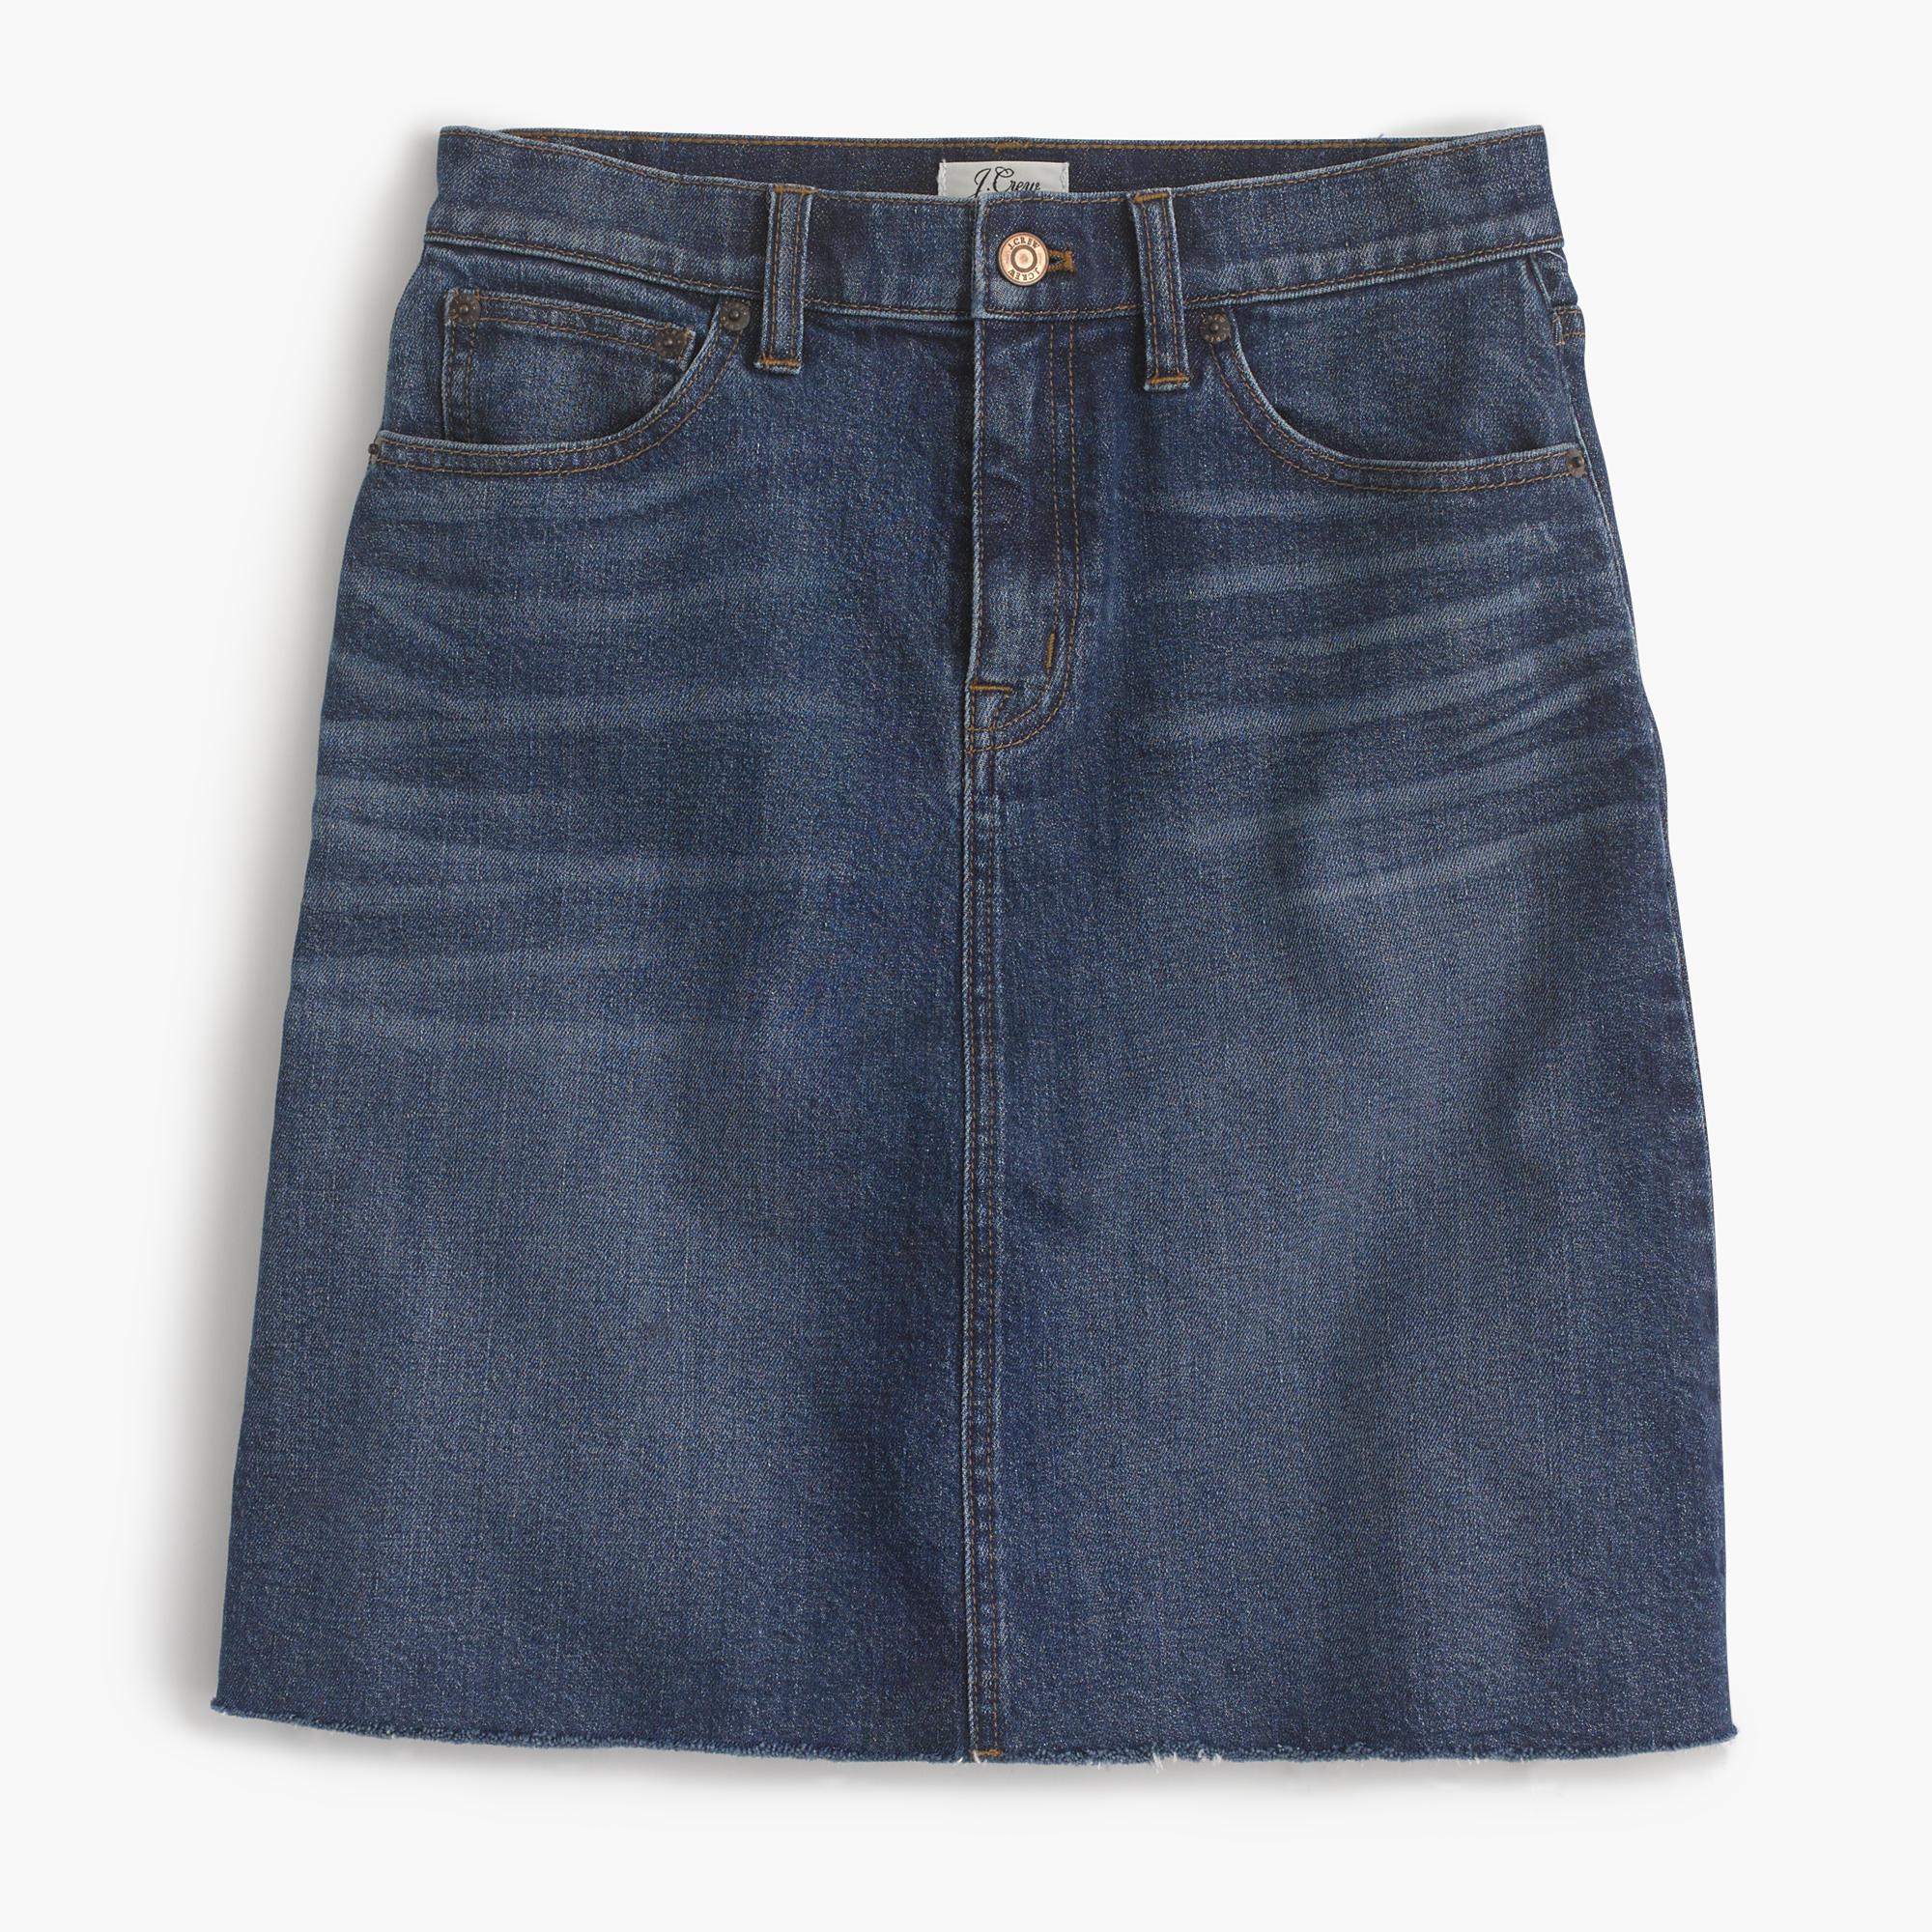 Denim skirt with raw hem : Women denim | J.Crew